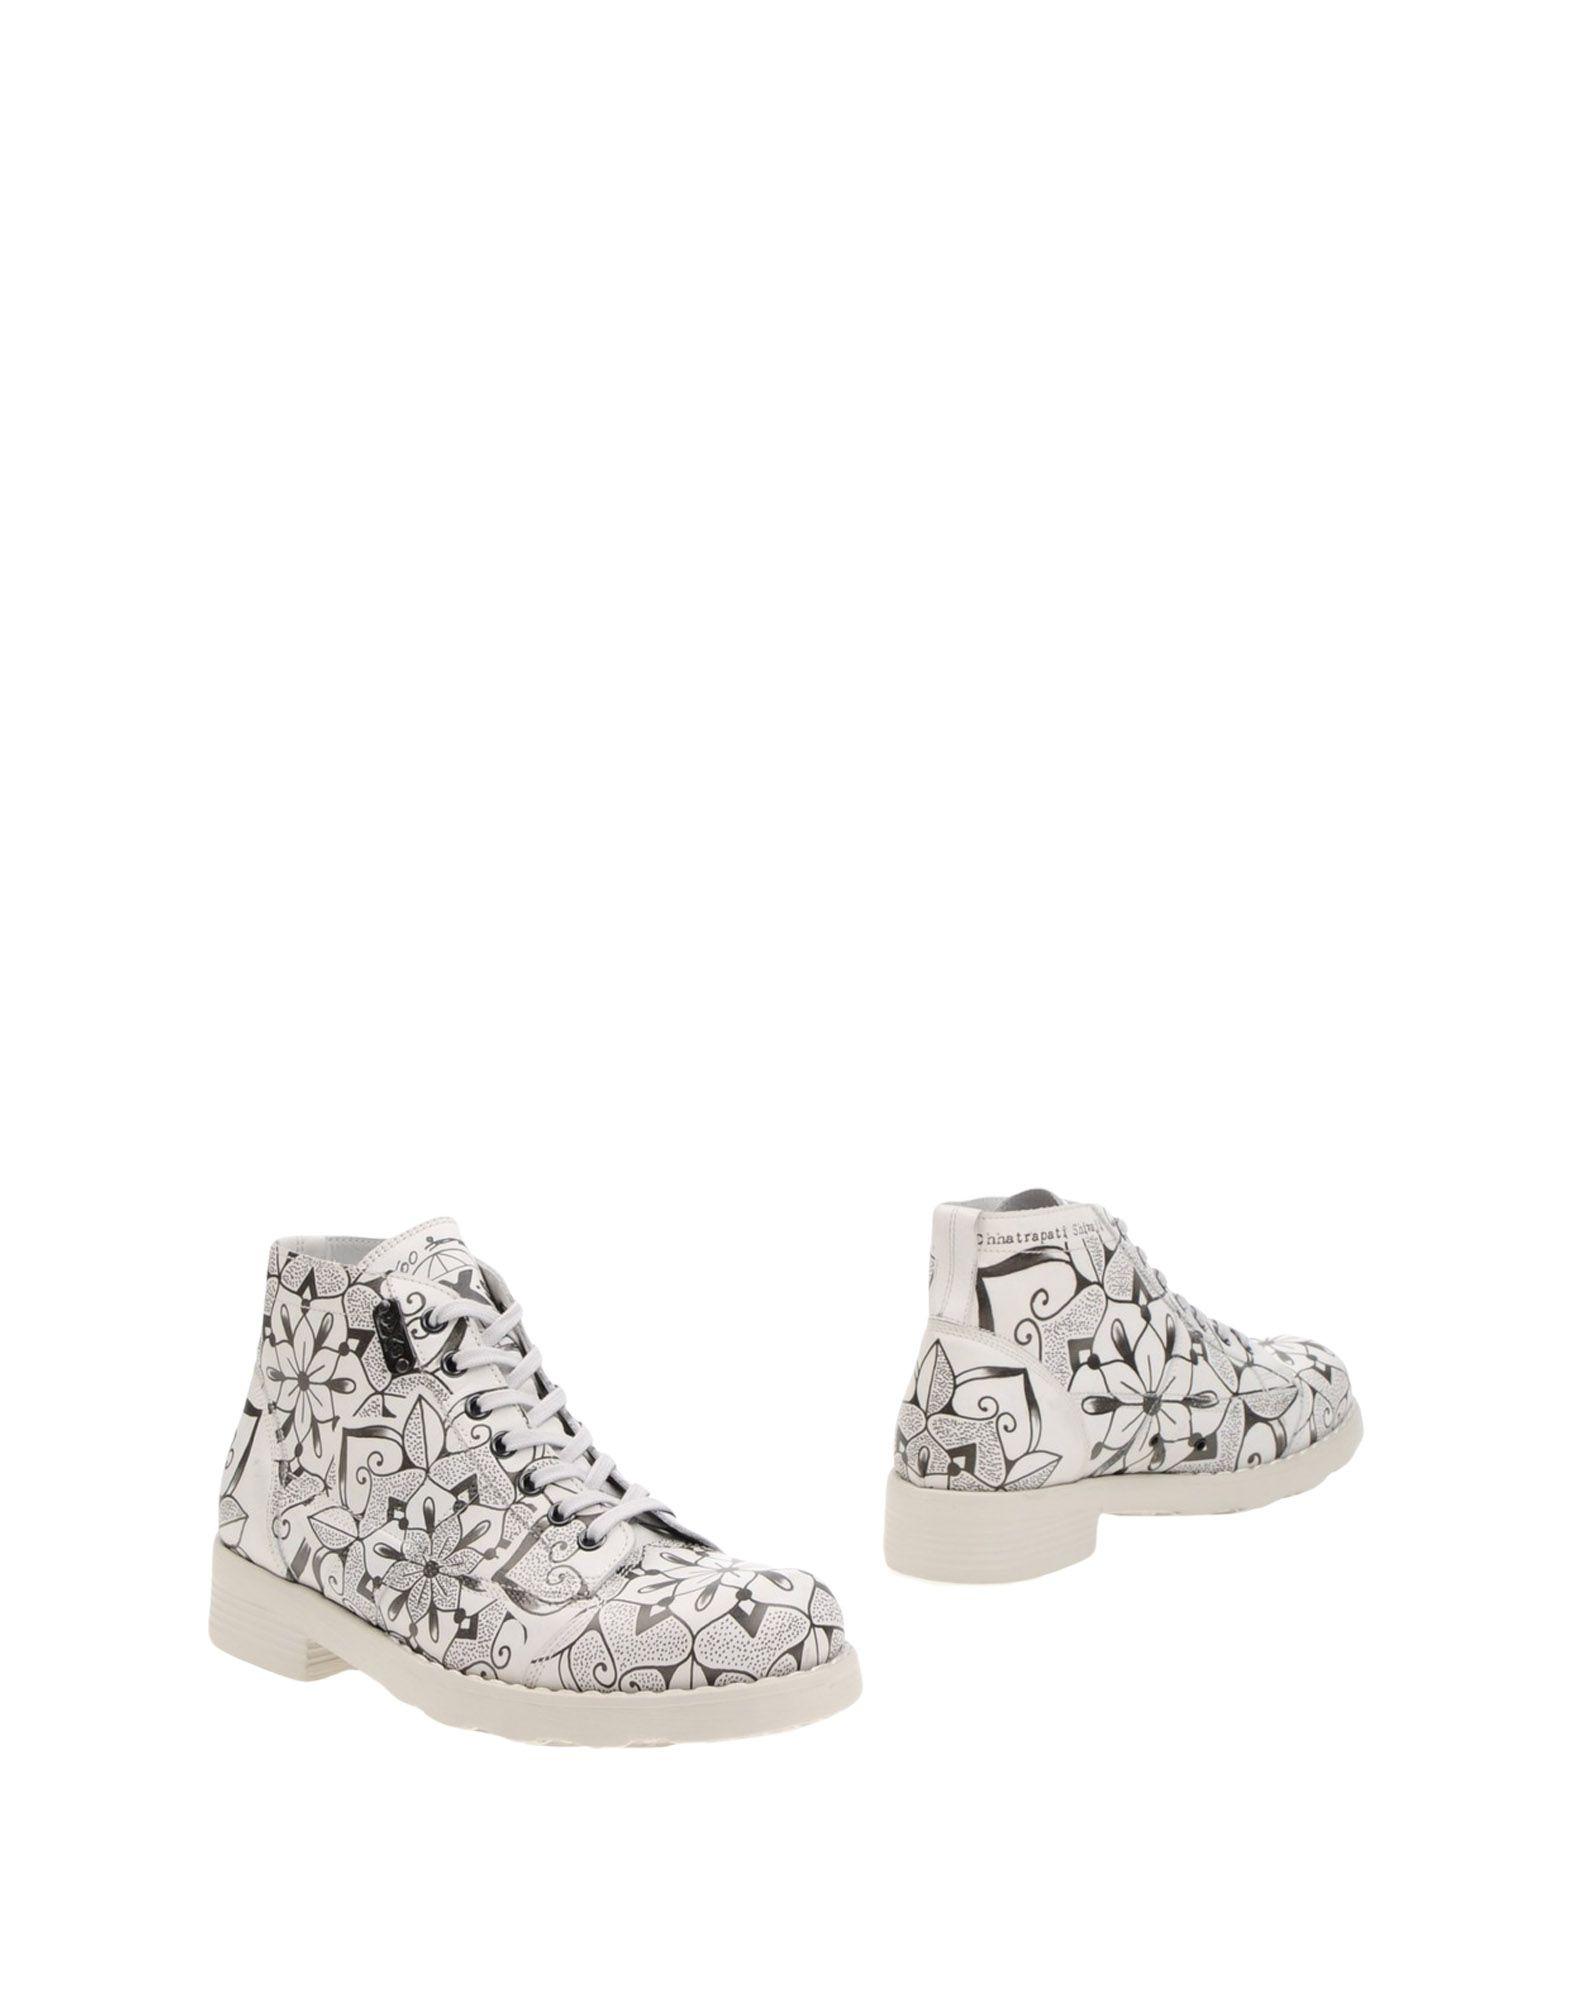 O.X.S. Stiefelette Stiefelette O.X.S. Damen  11406950JR Gute Qualität beliebte Schuhe 25661e